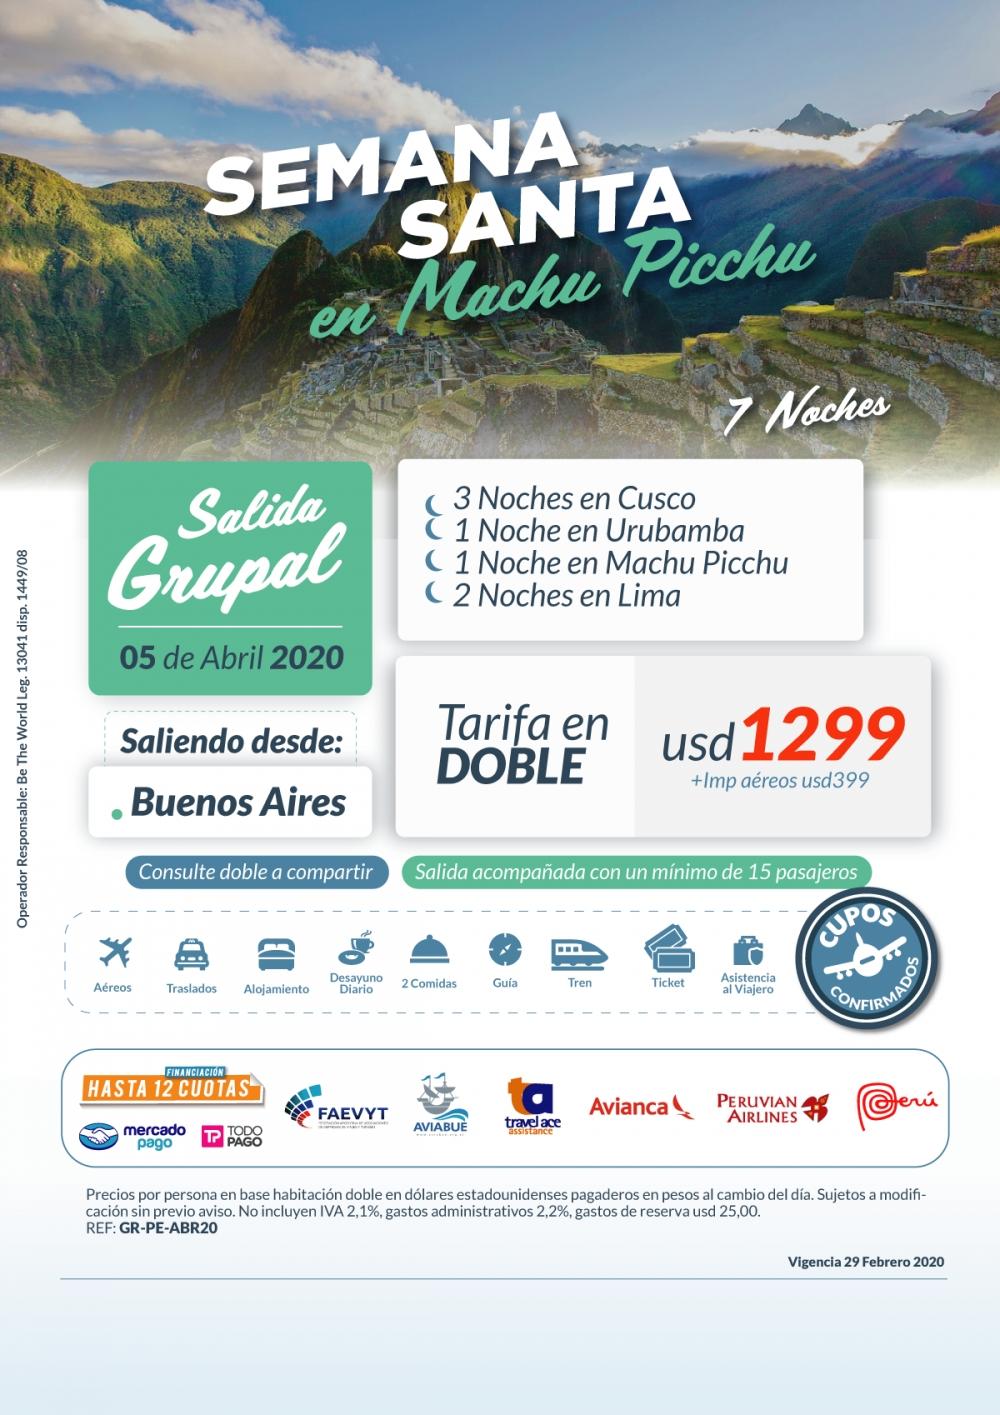 SEMANA SANTA EN MACHU PICCHU - Salida Grupal - 05 de Abril 2020